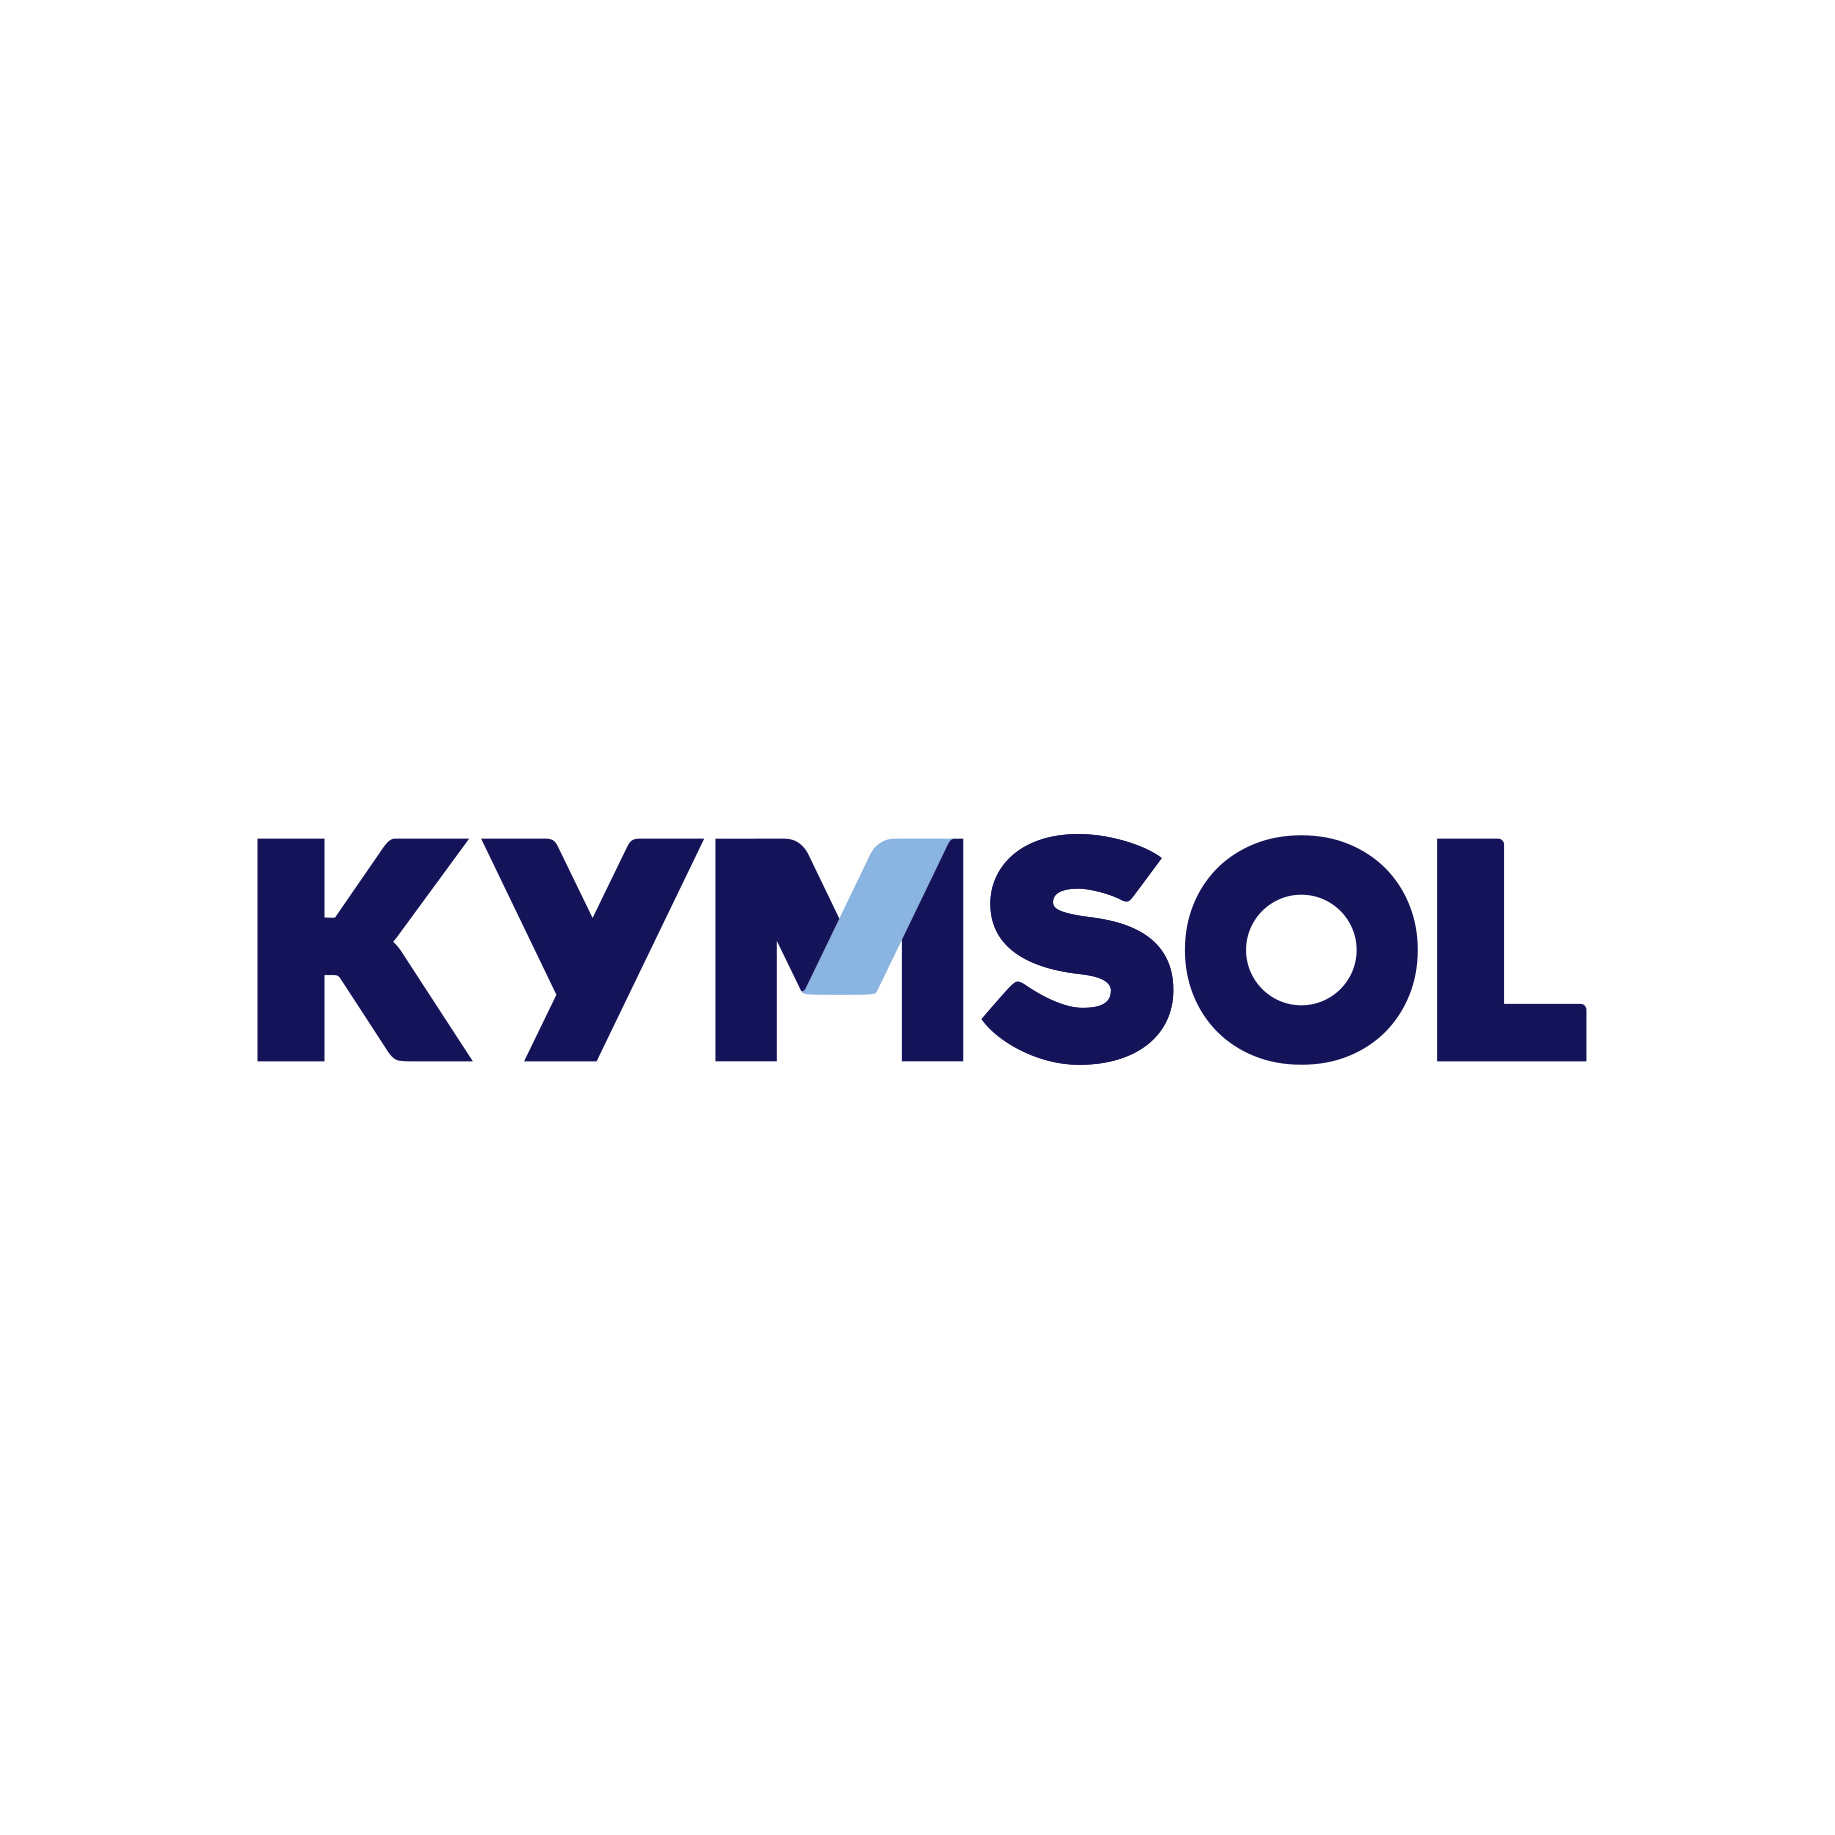 Kymsol Oy